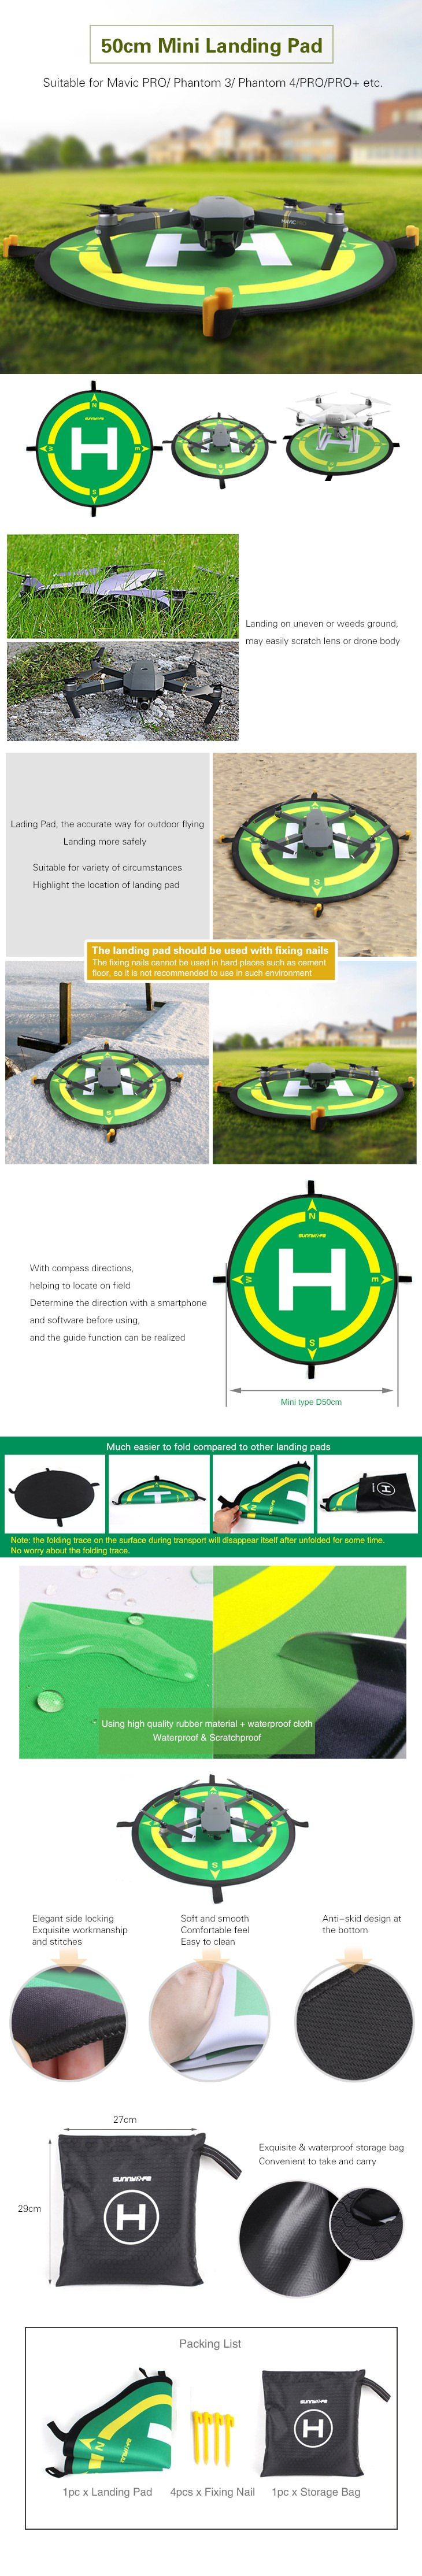 Sunnylife Foldable Drone Parking Landing Field Landing Pad with Compass Directions for DJI Phantom 4 3 SPARK Mavic Pro